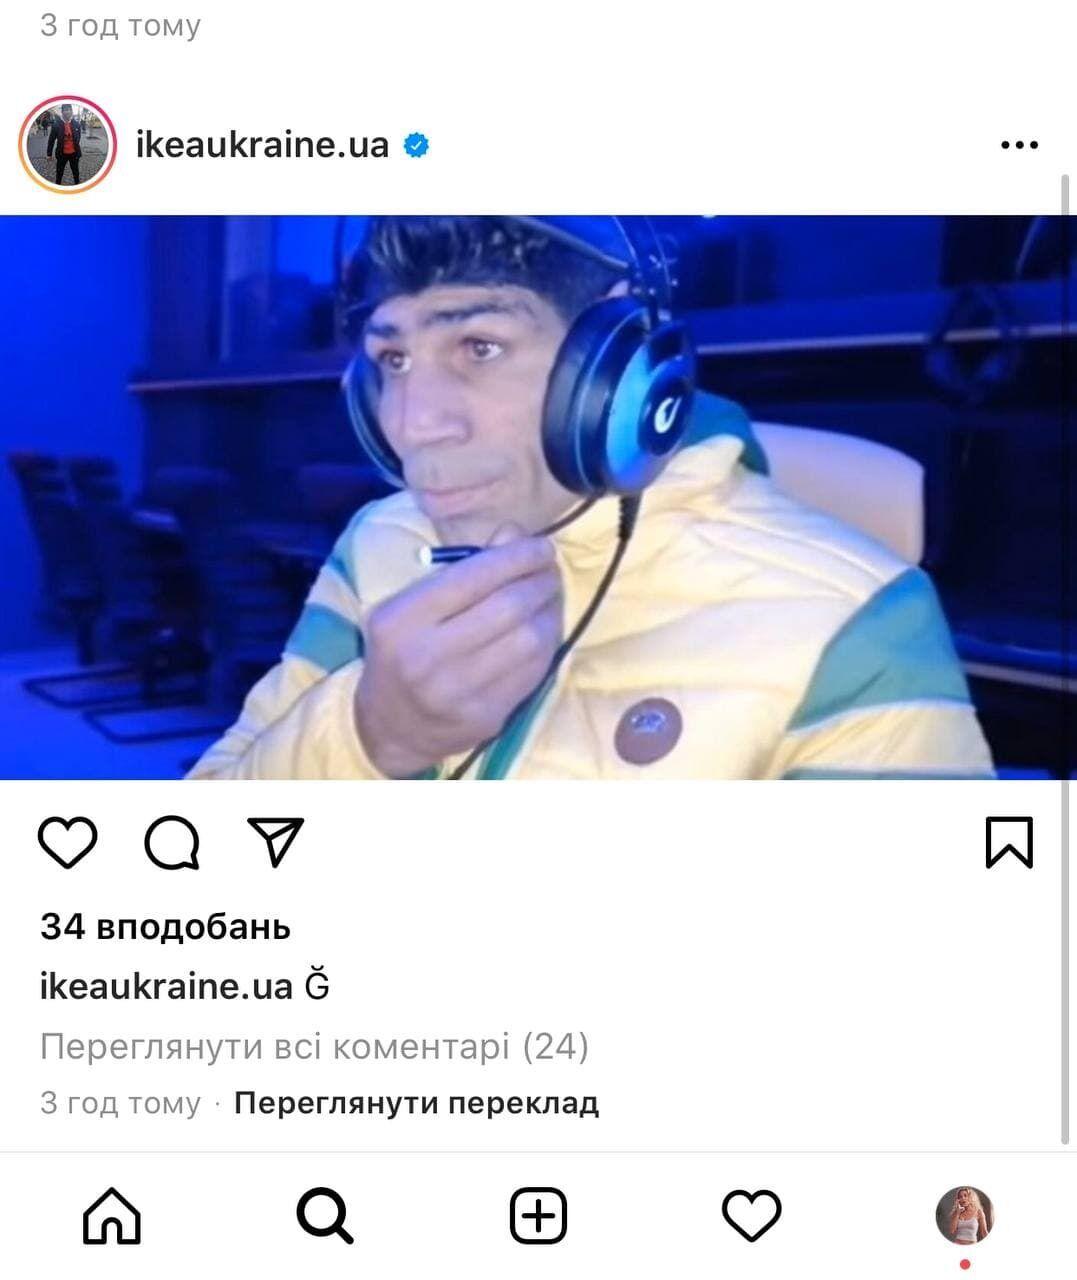 Украинский аккаунт IKEA в Instagram взломали